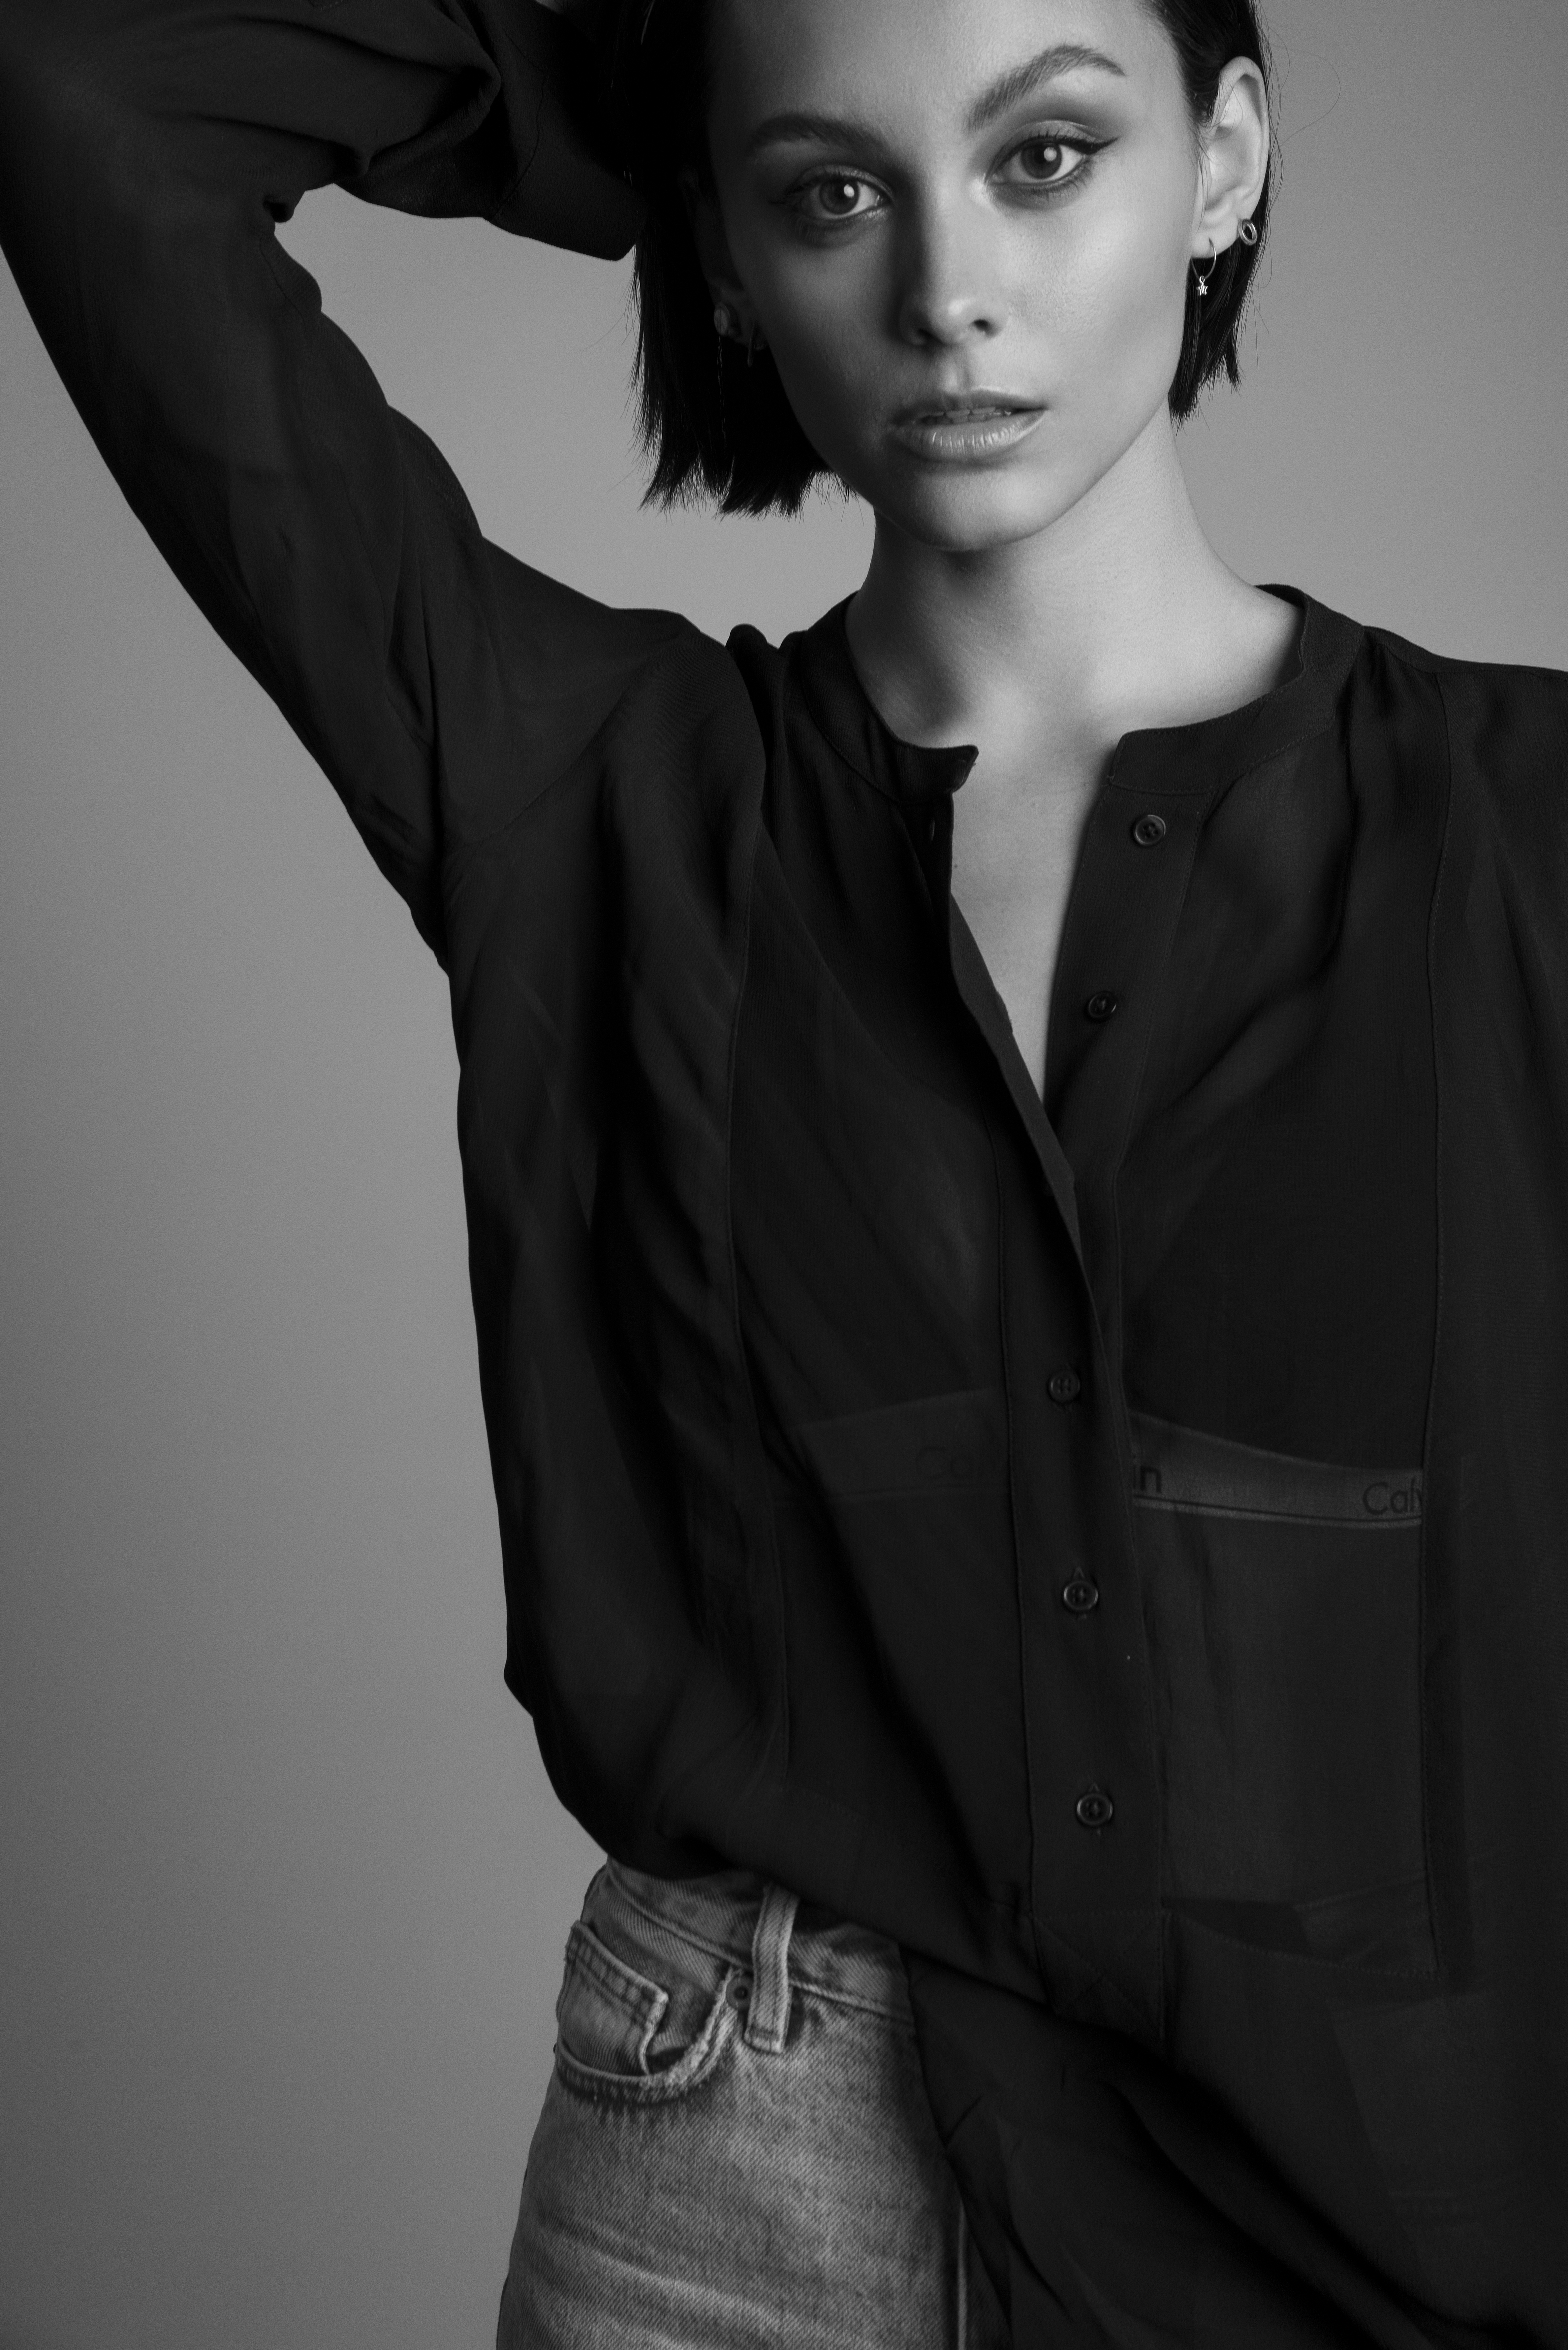 Sophie shot by Matt Leach Photography